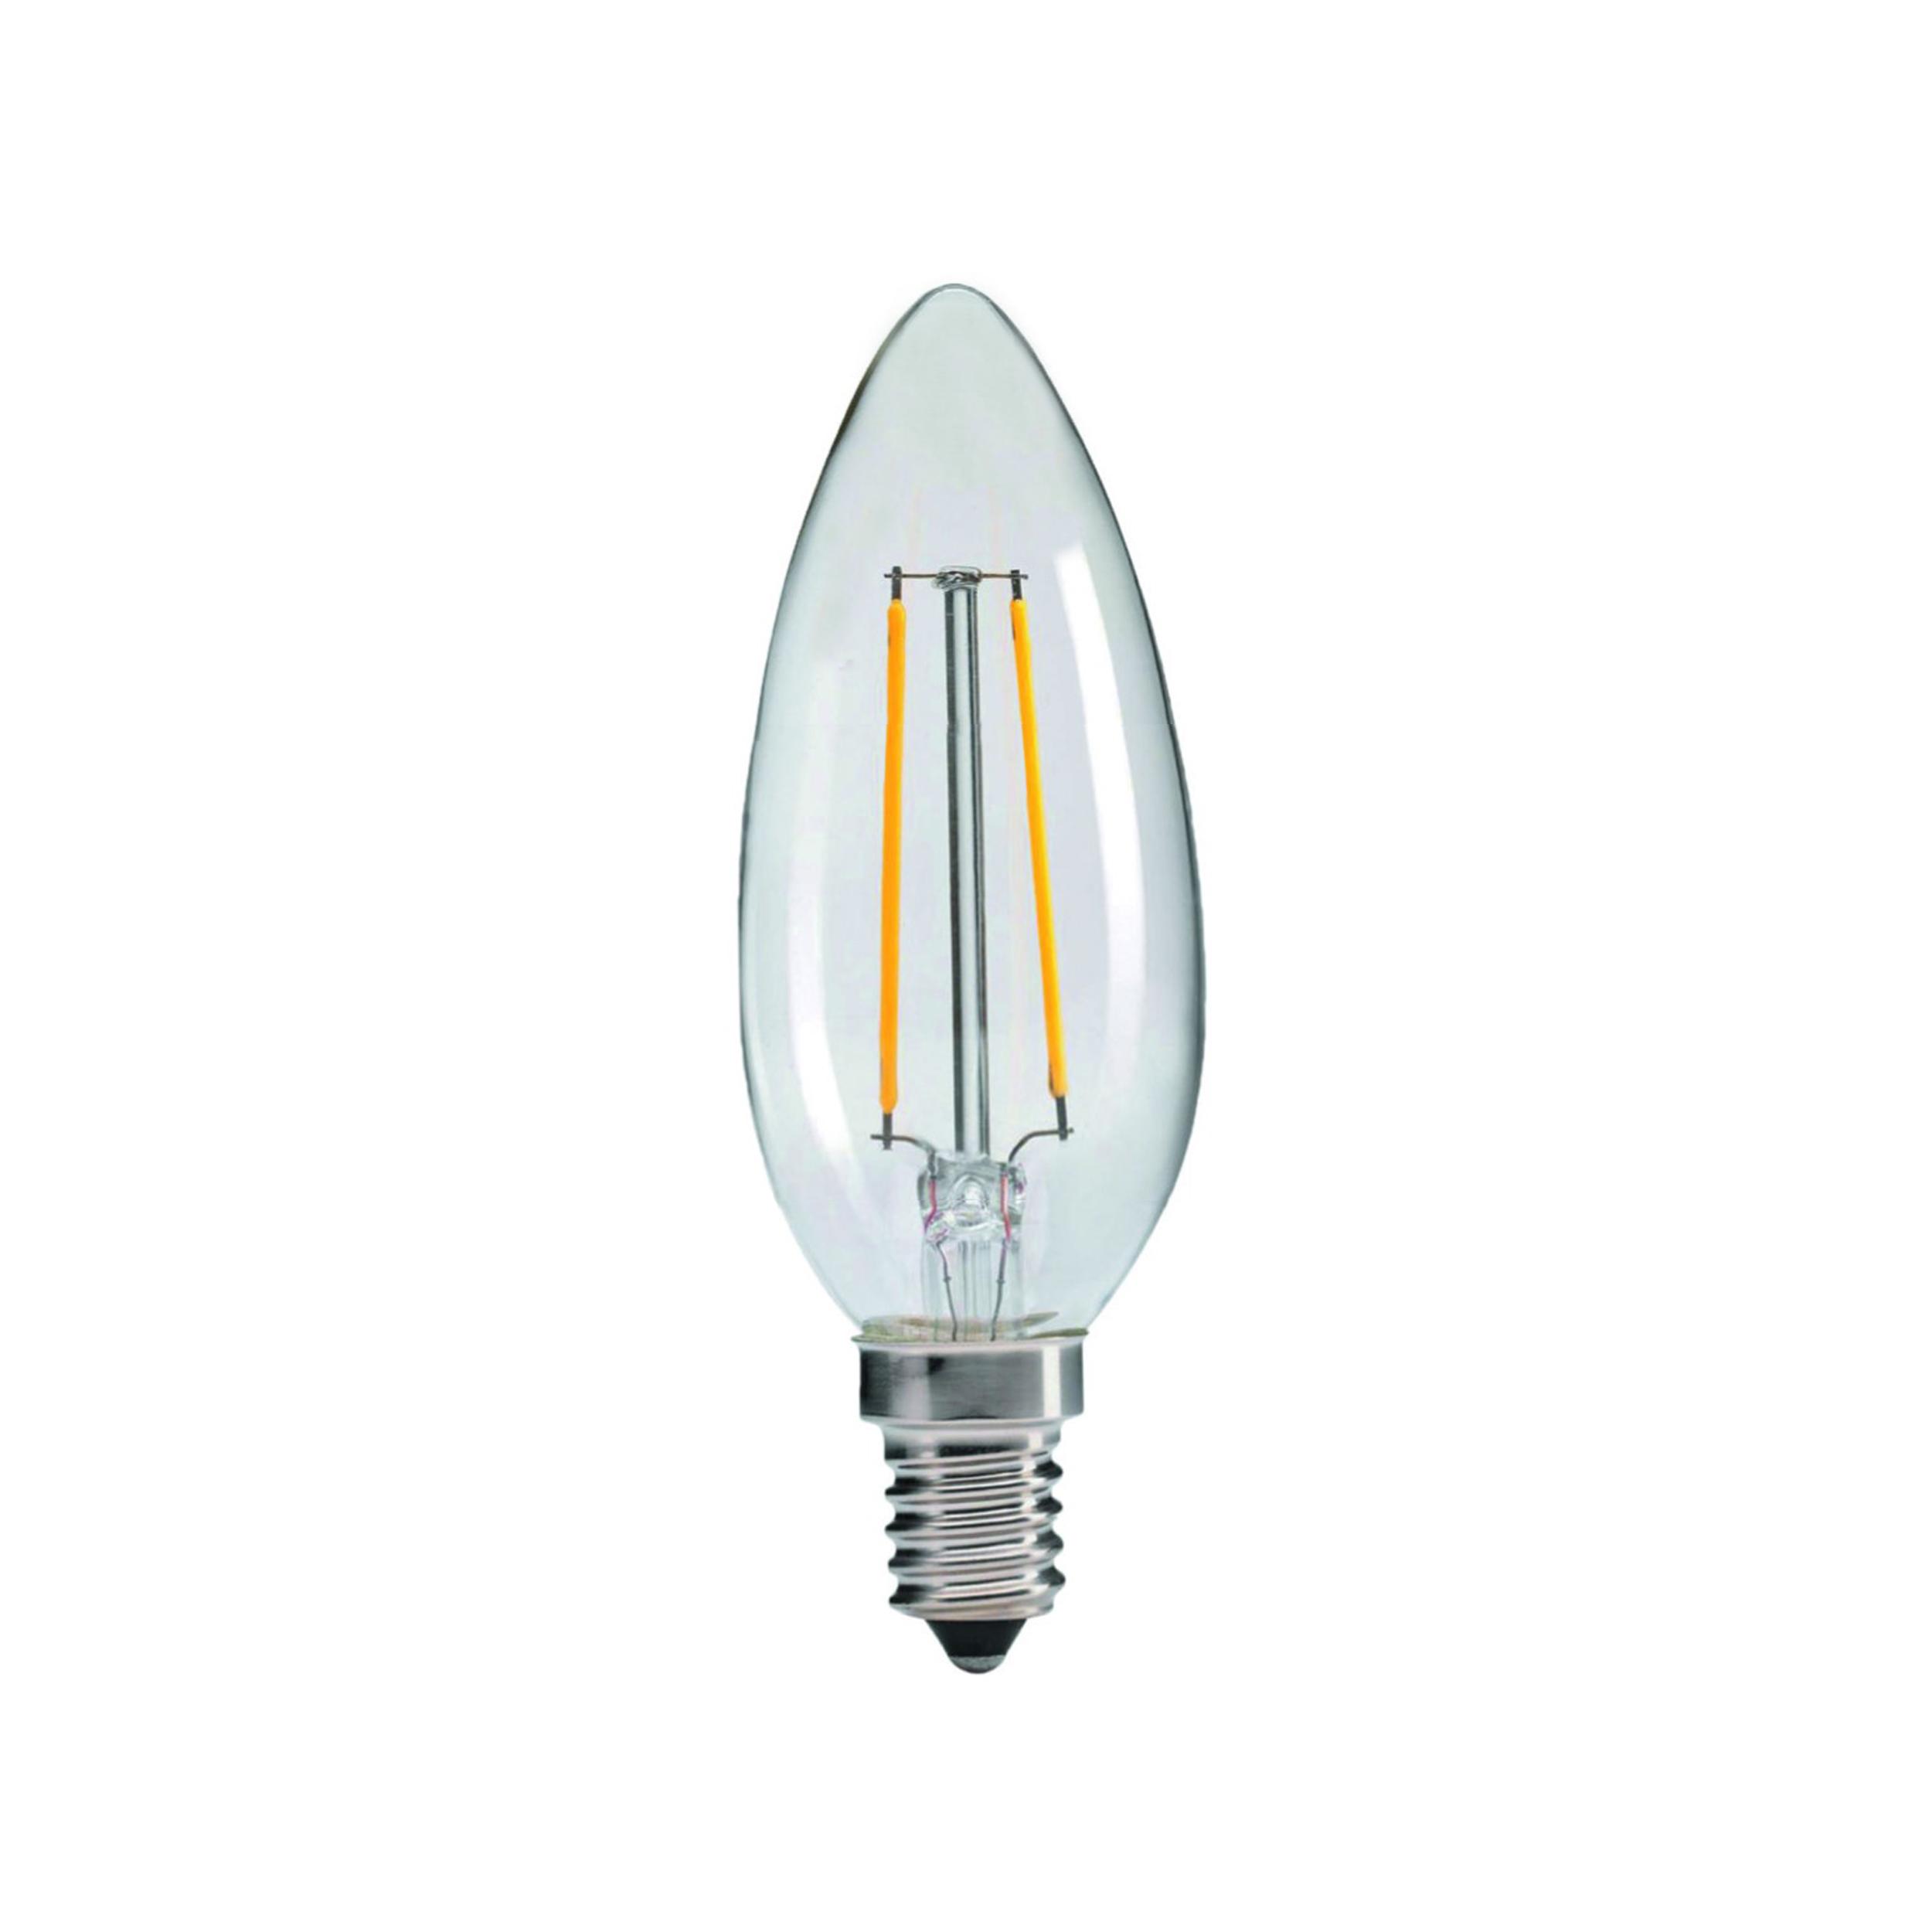 لامپ ال ای دی فیلامینتی 4 وات زک کد C35 پایهE14